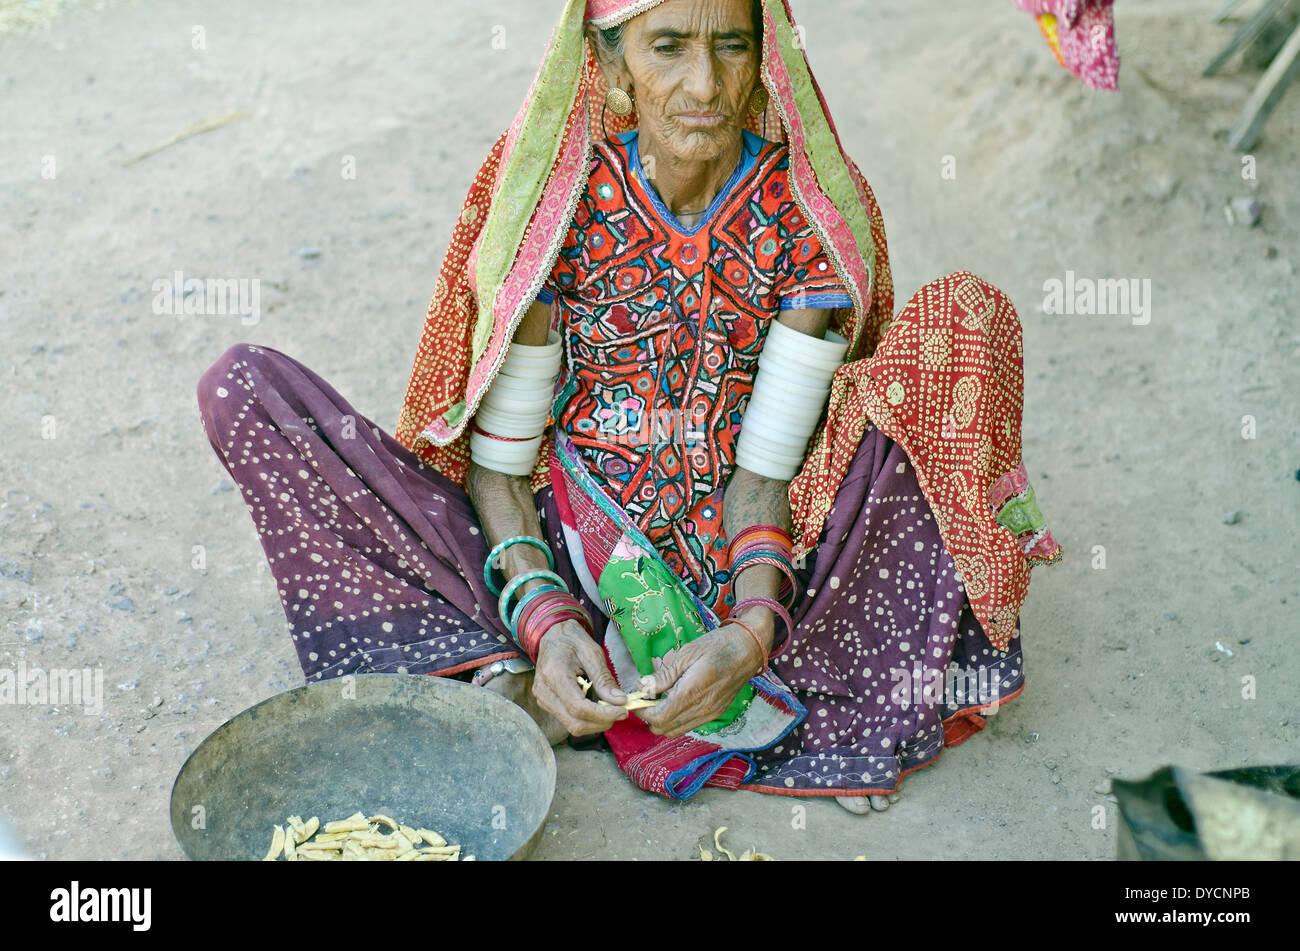 Harijan woman ,Jnan ,Kutch,India - Stock Image